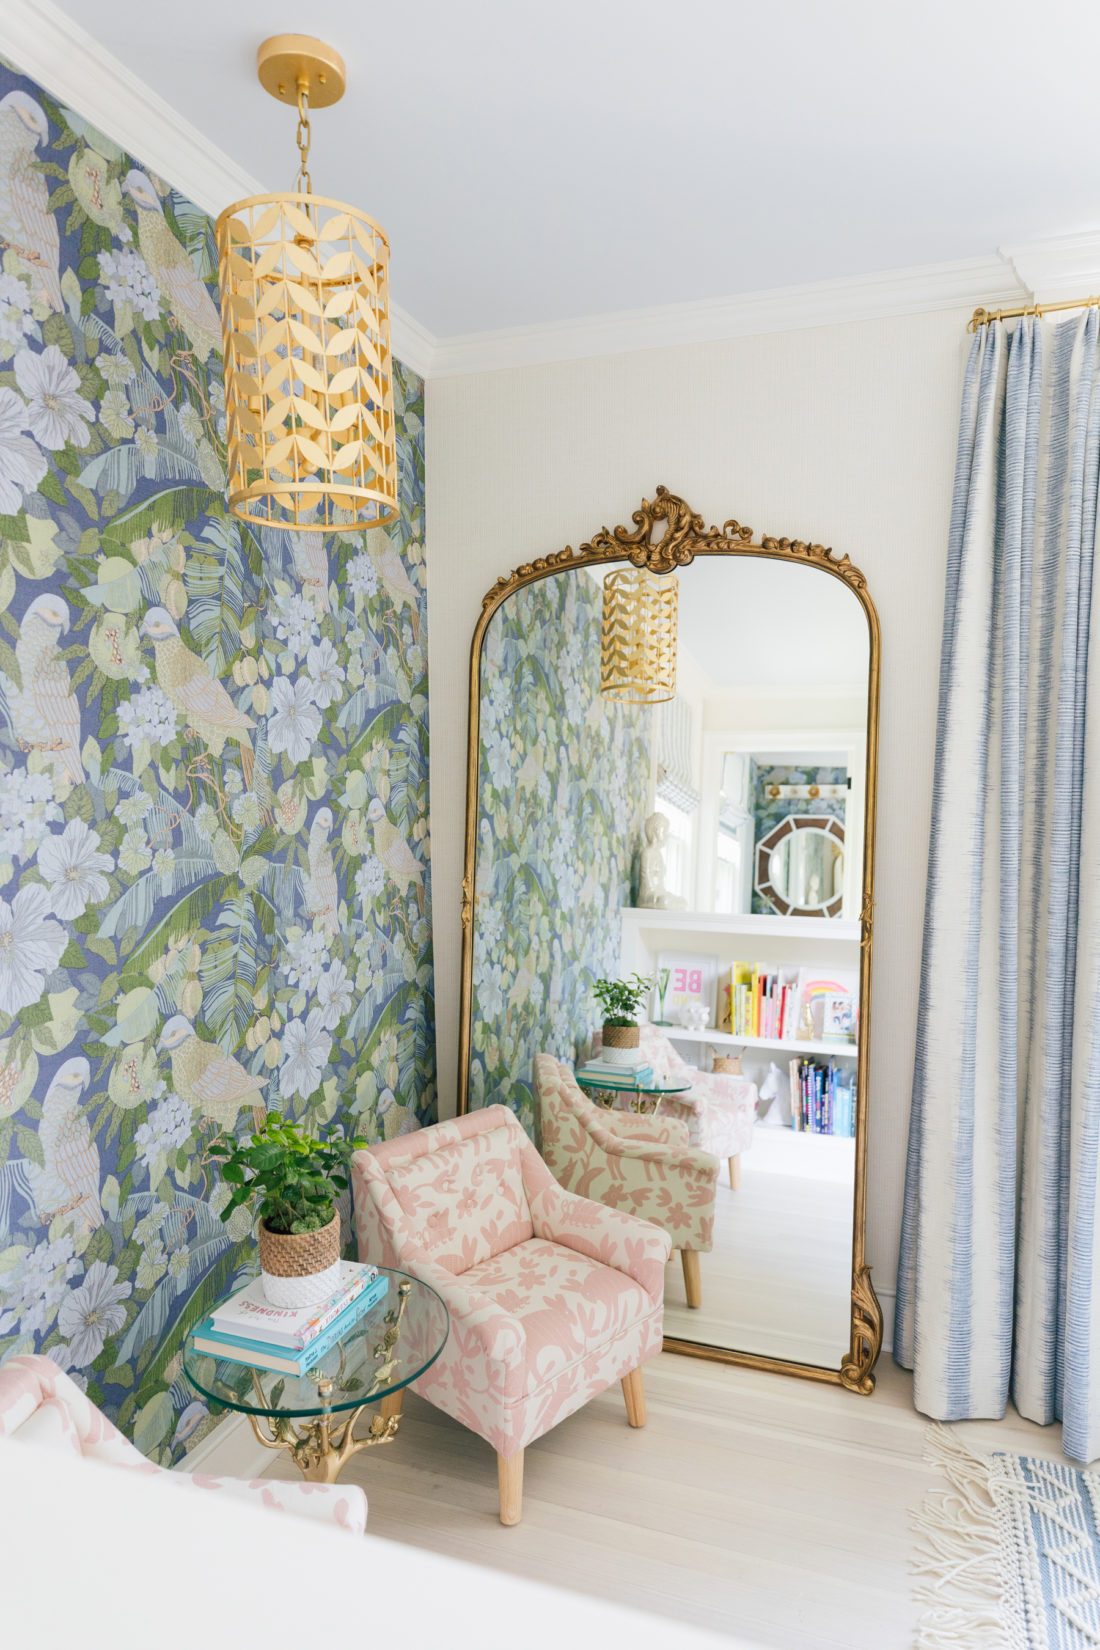 Eva Amurri's daughter Marlowe's Connecticut bedroom featuring Schumacher shade fabric